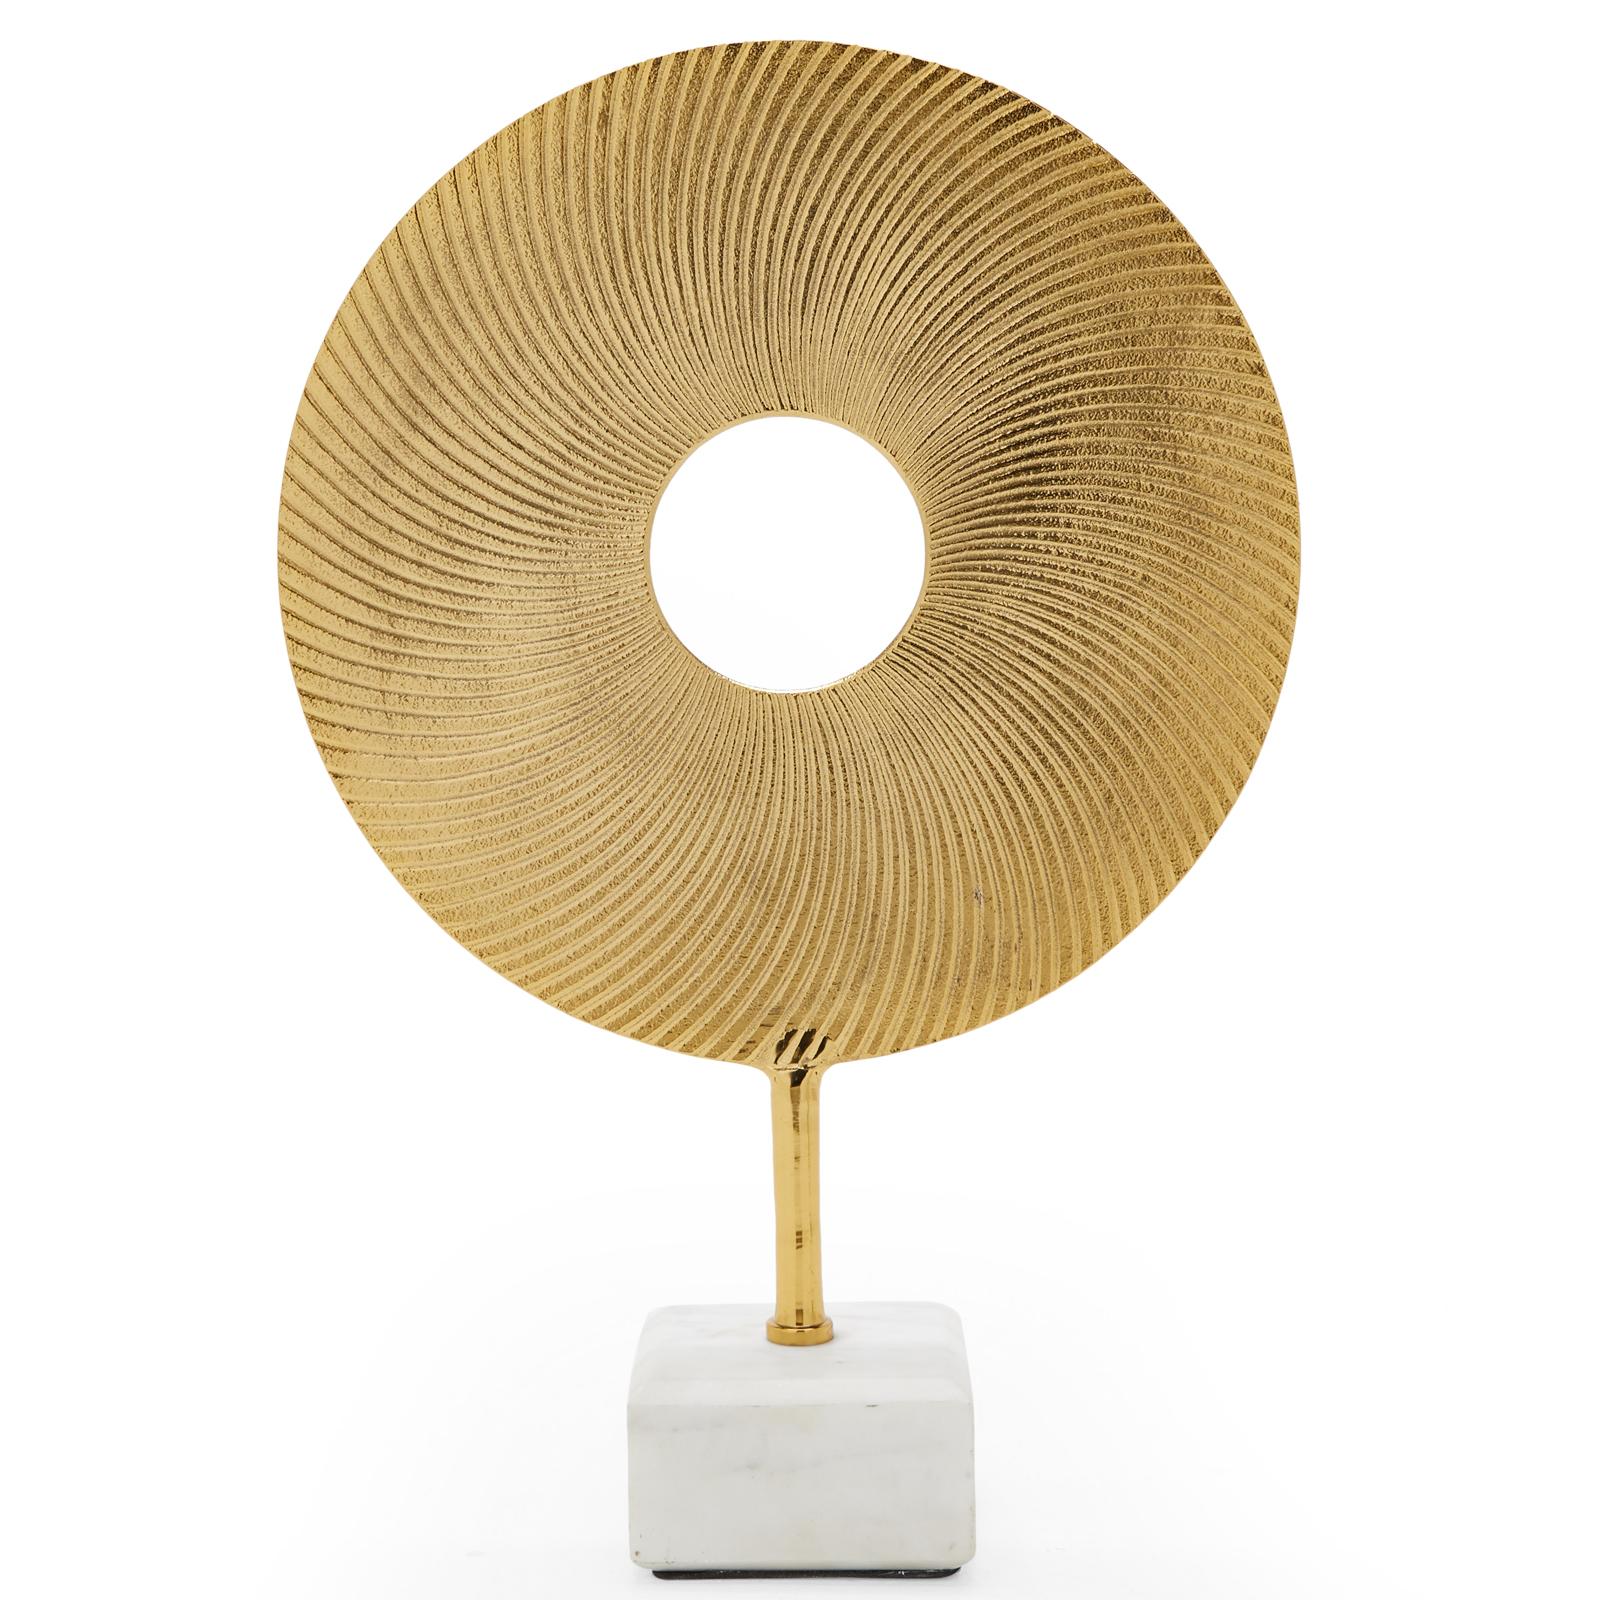 Details About Glam Decorative Circle Sculpture Aluminum Gold Marble Base Tabletop Home Decor